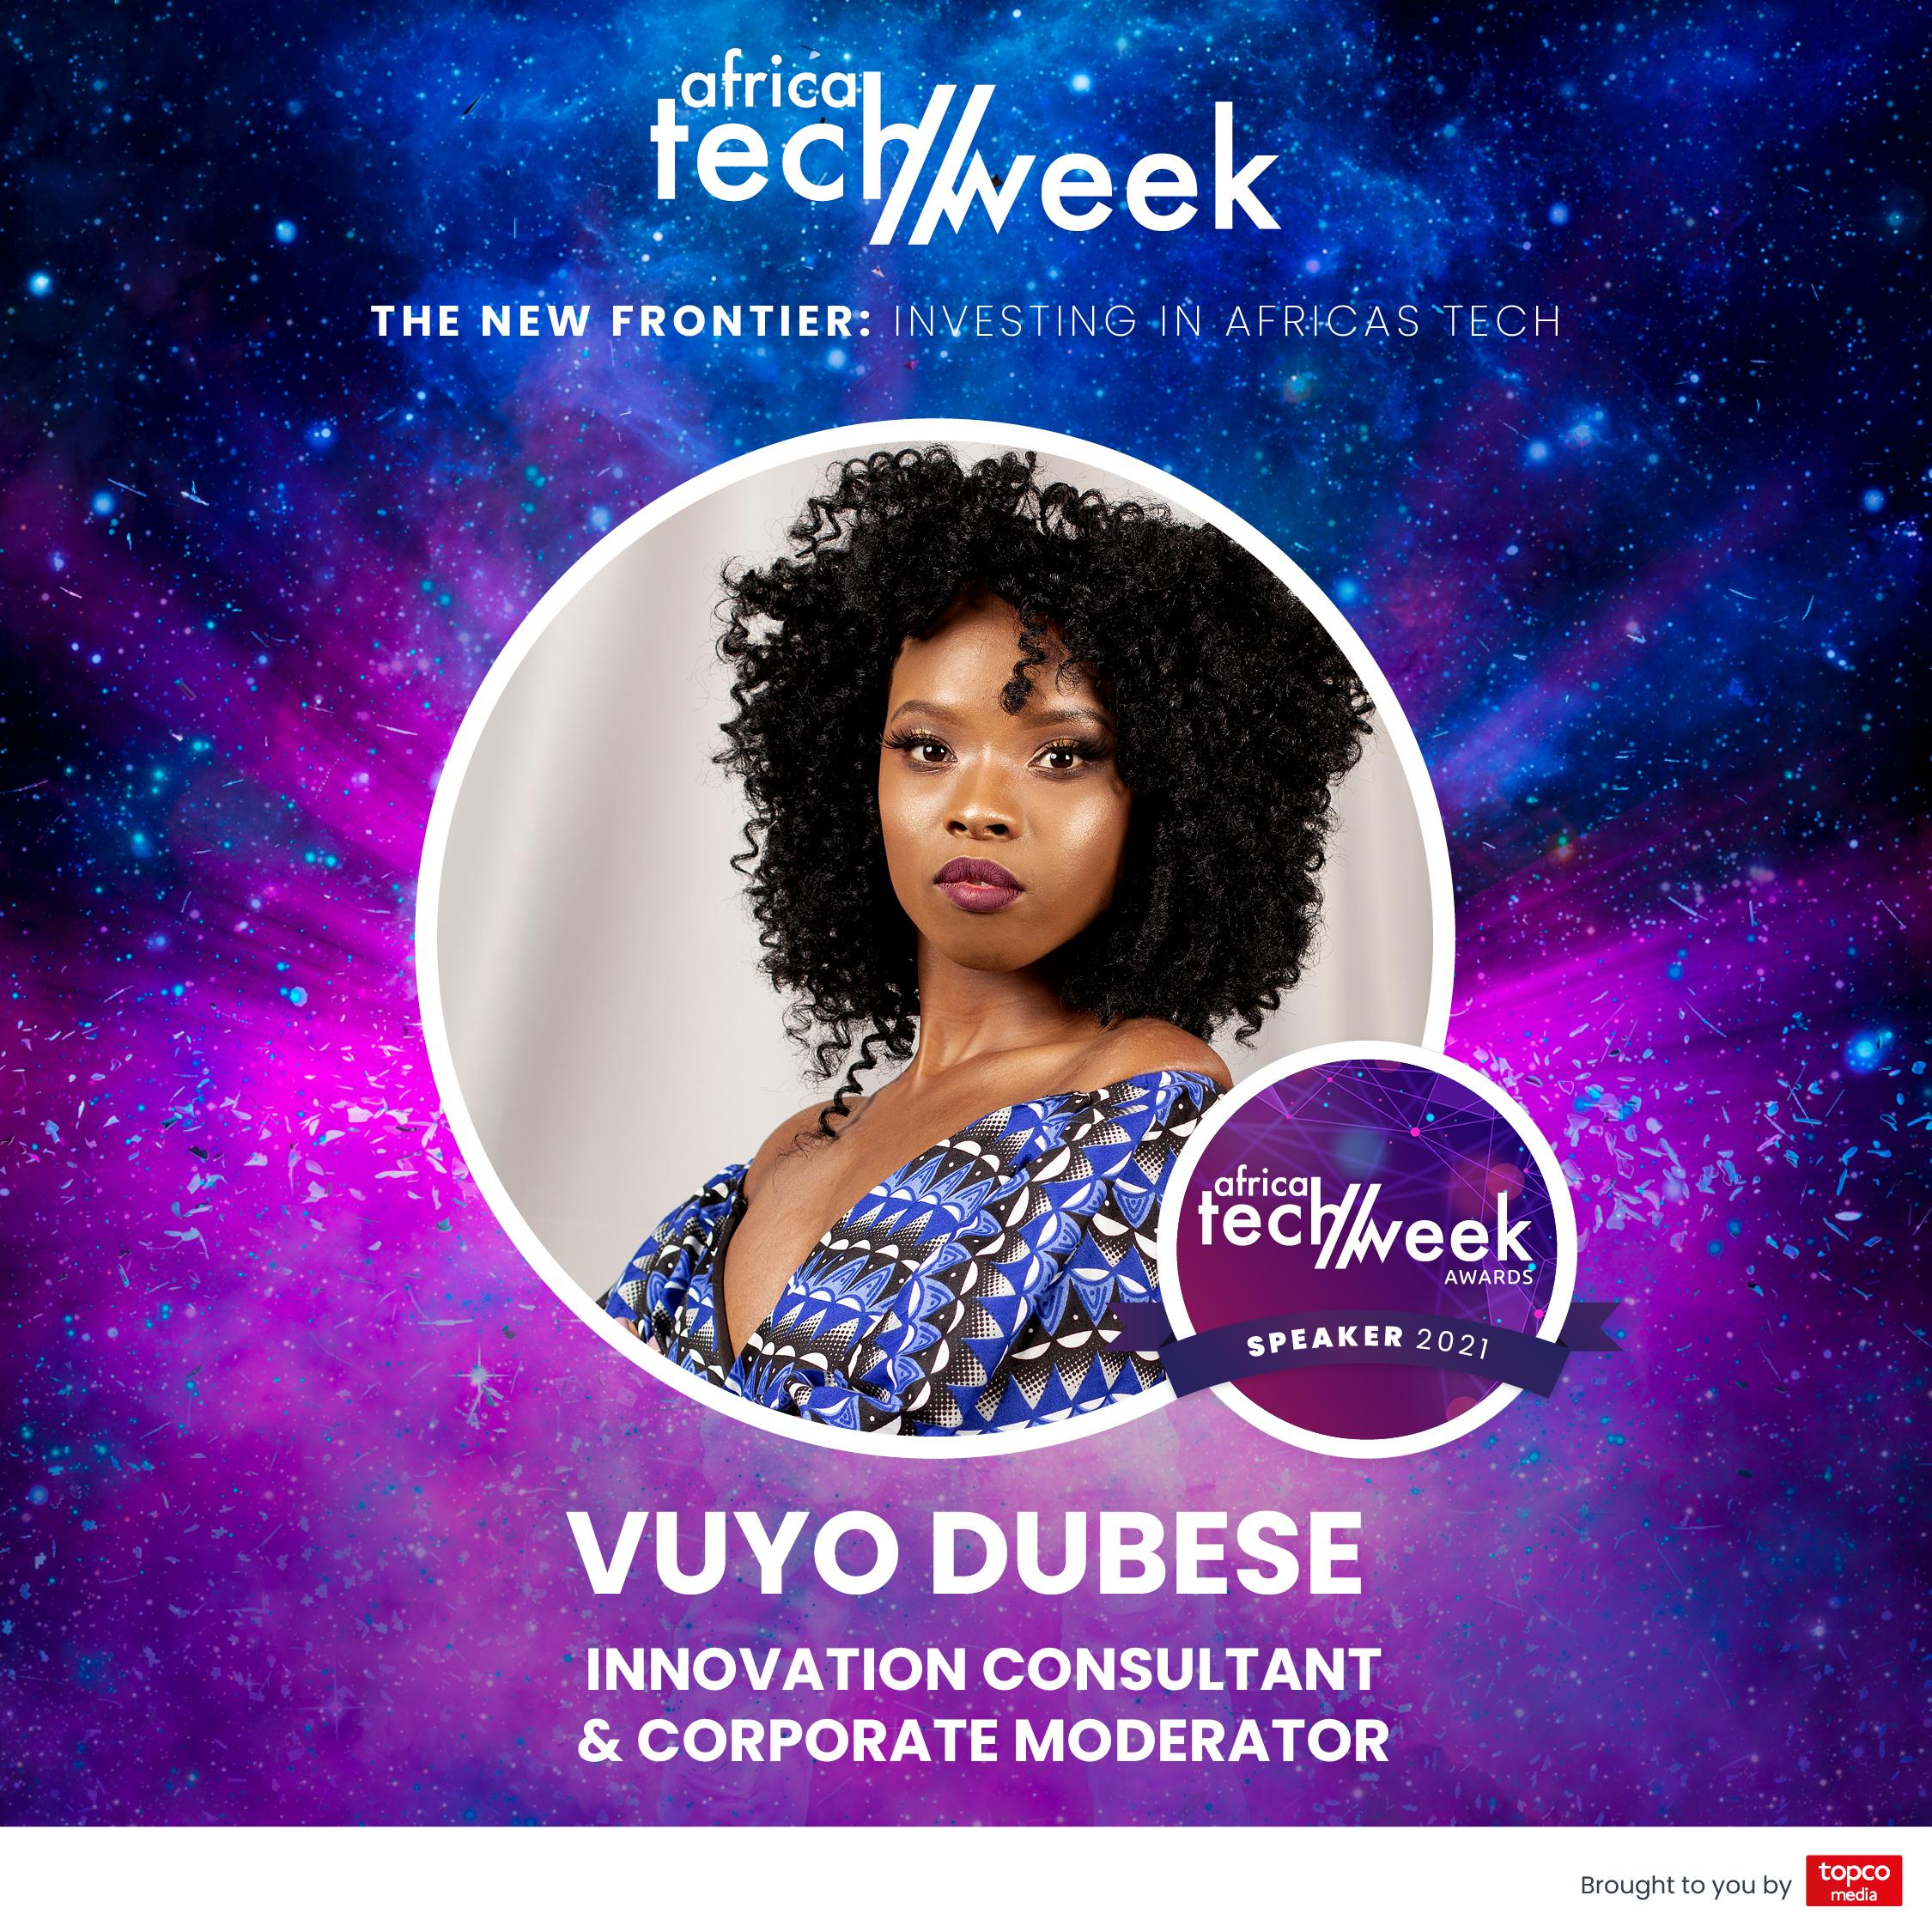 Vuyo Dubese